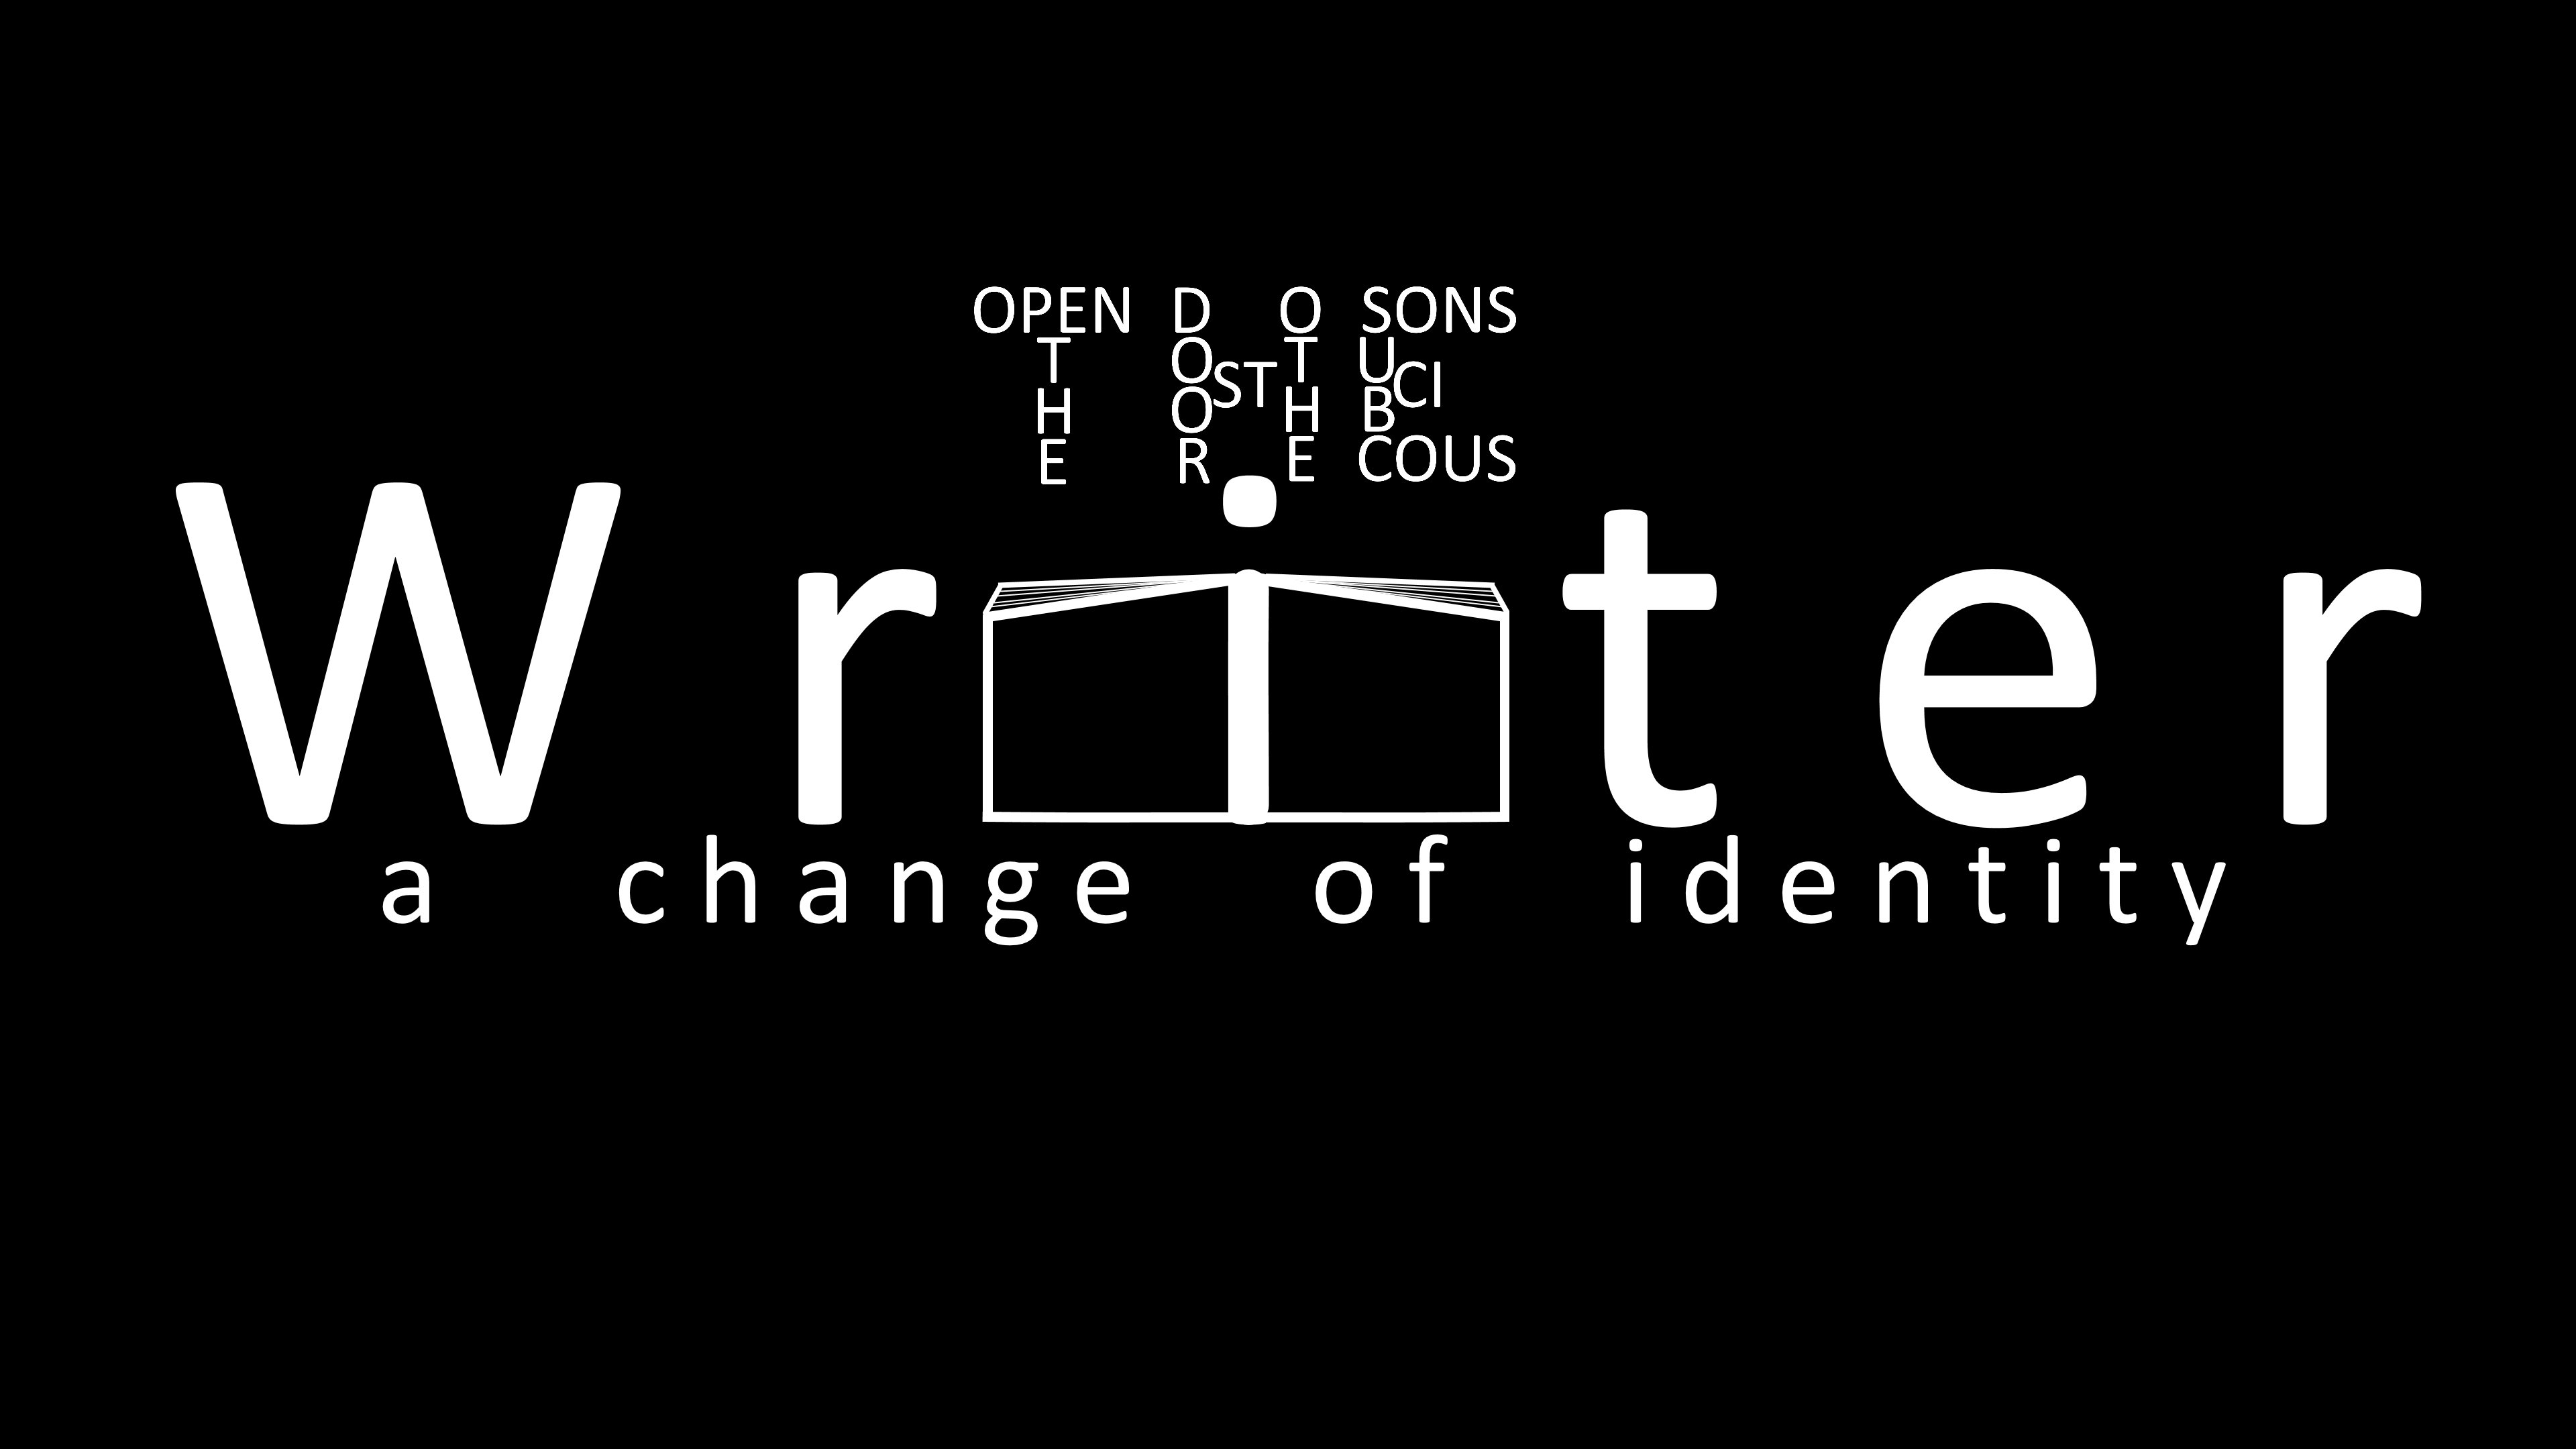 THE WRITER: СМЕНА ЛИЧНОСТИ. - Изображение 1